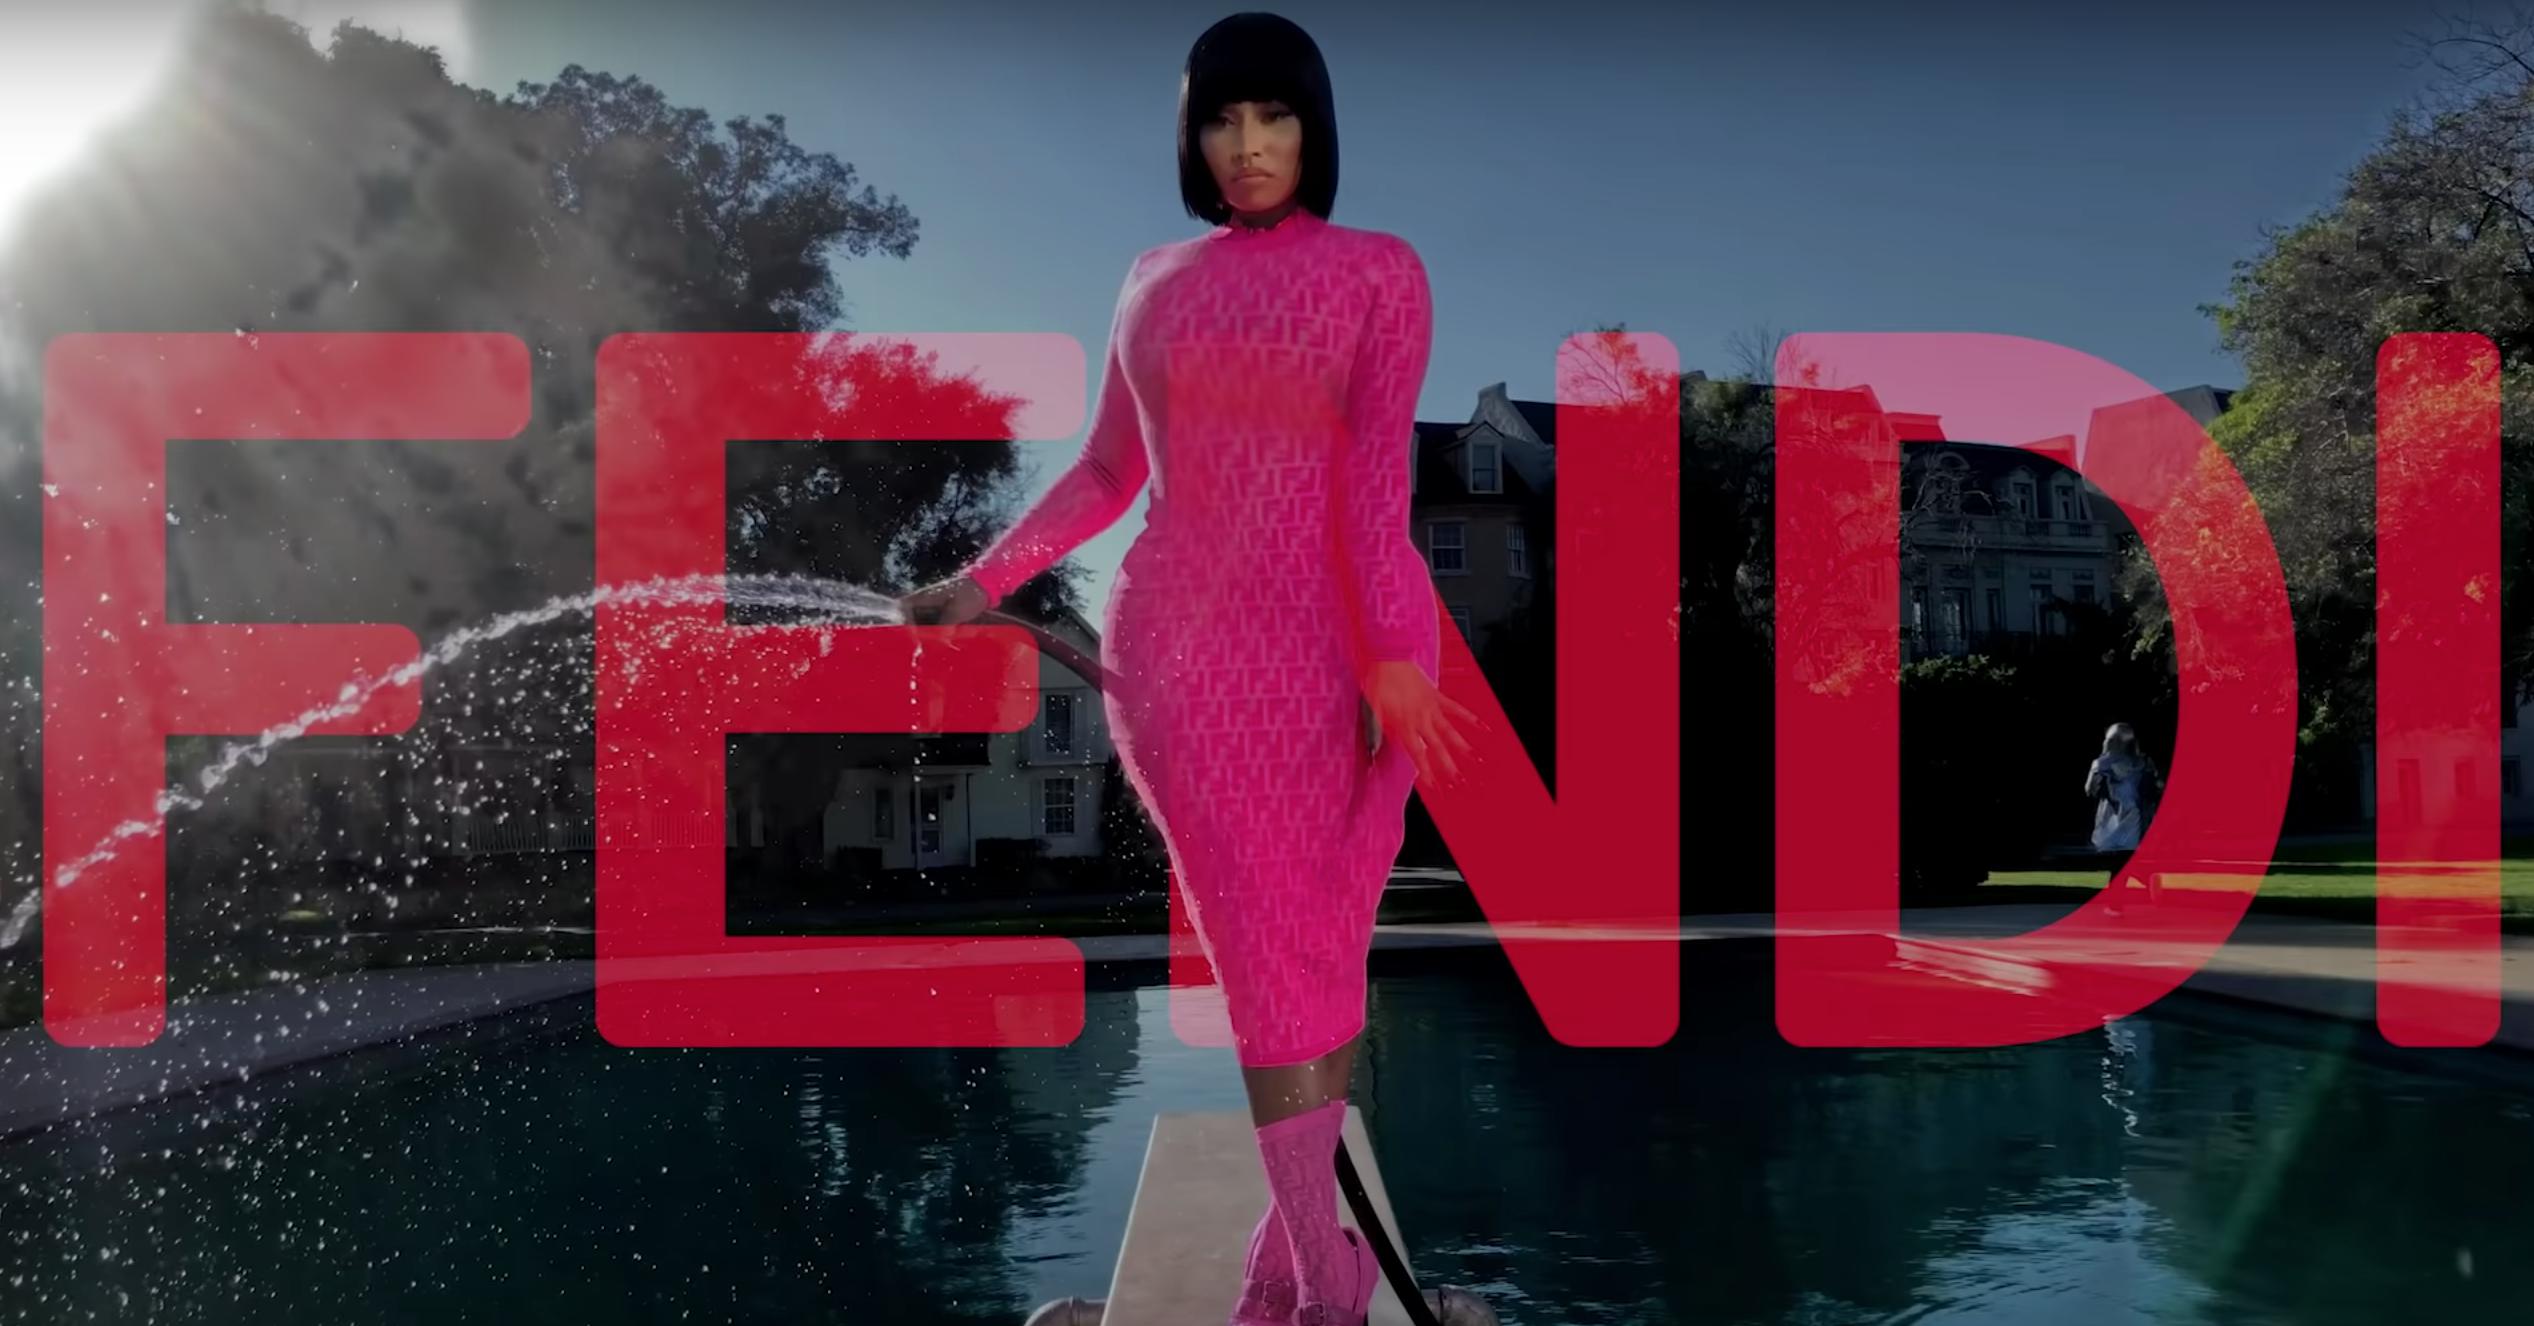 The Nicki Minaj x Fendi Collab Has Dropped Online